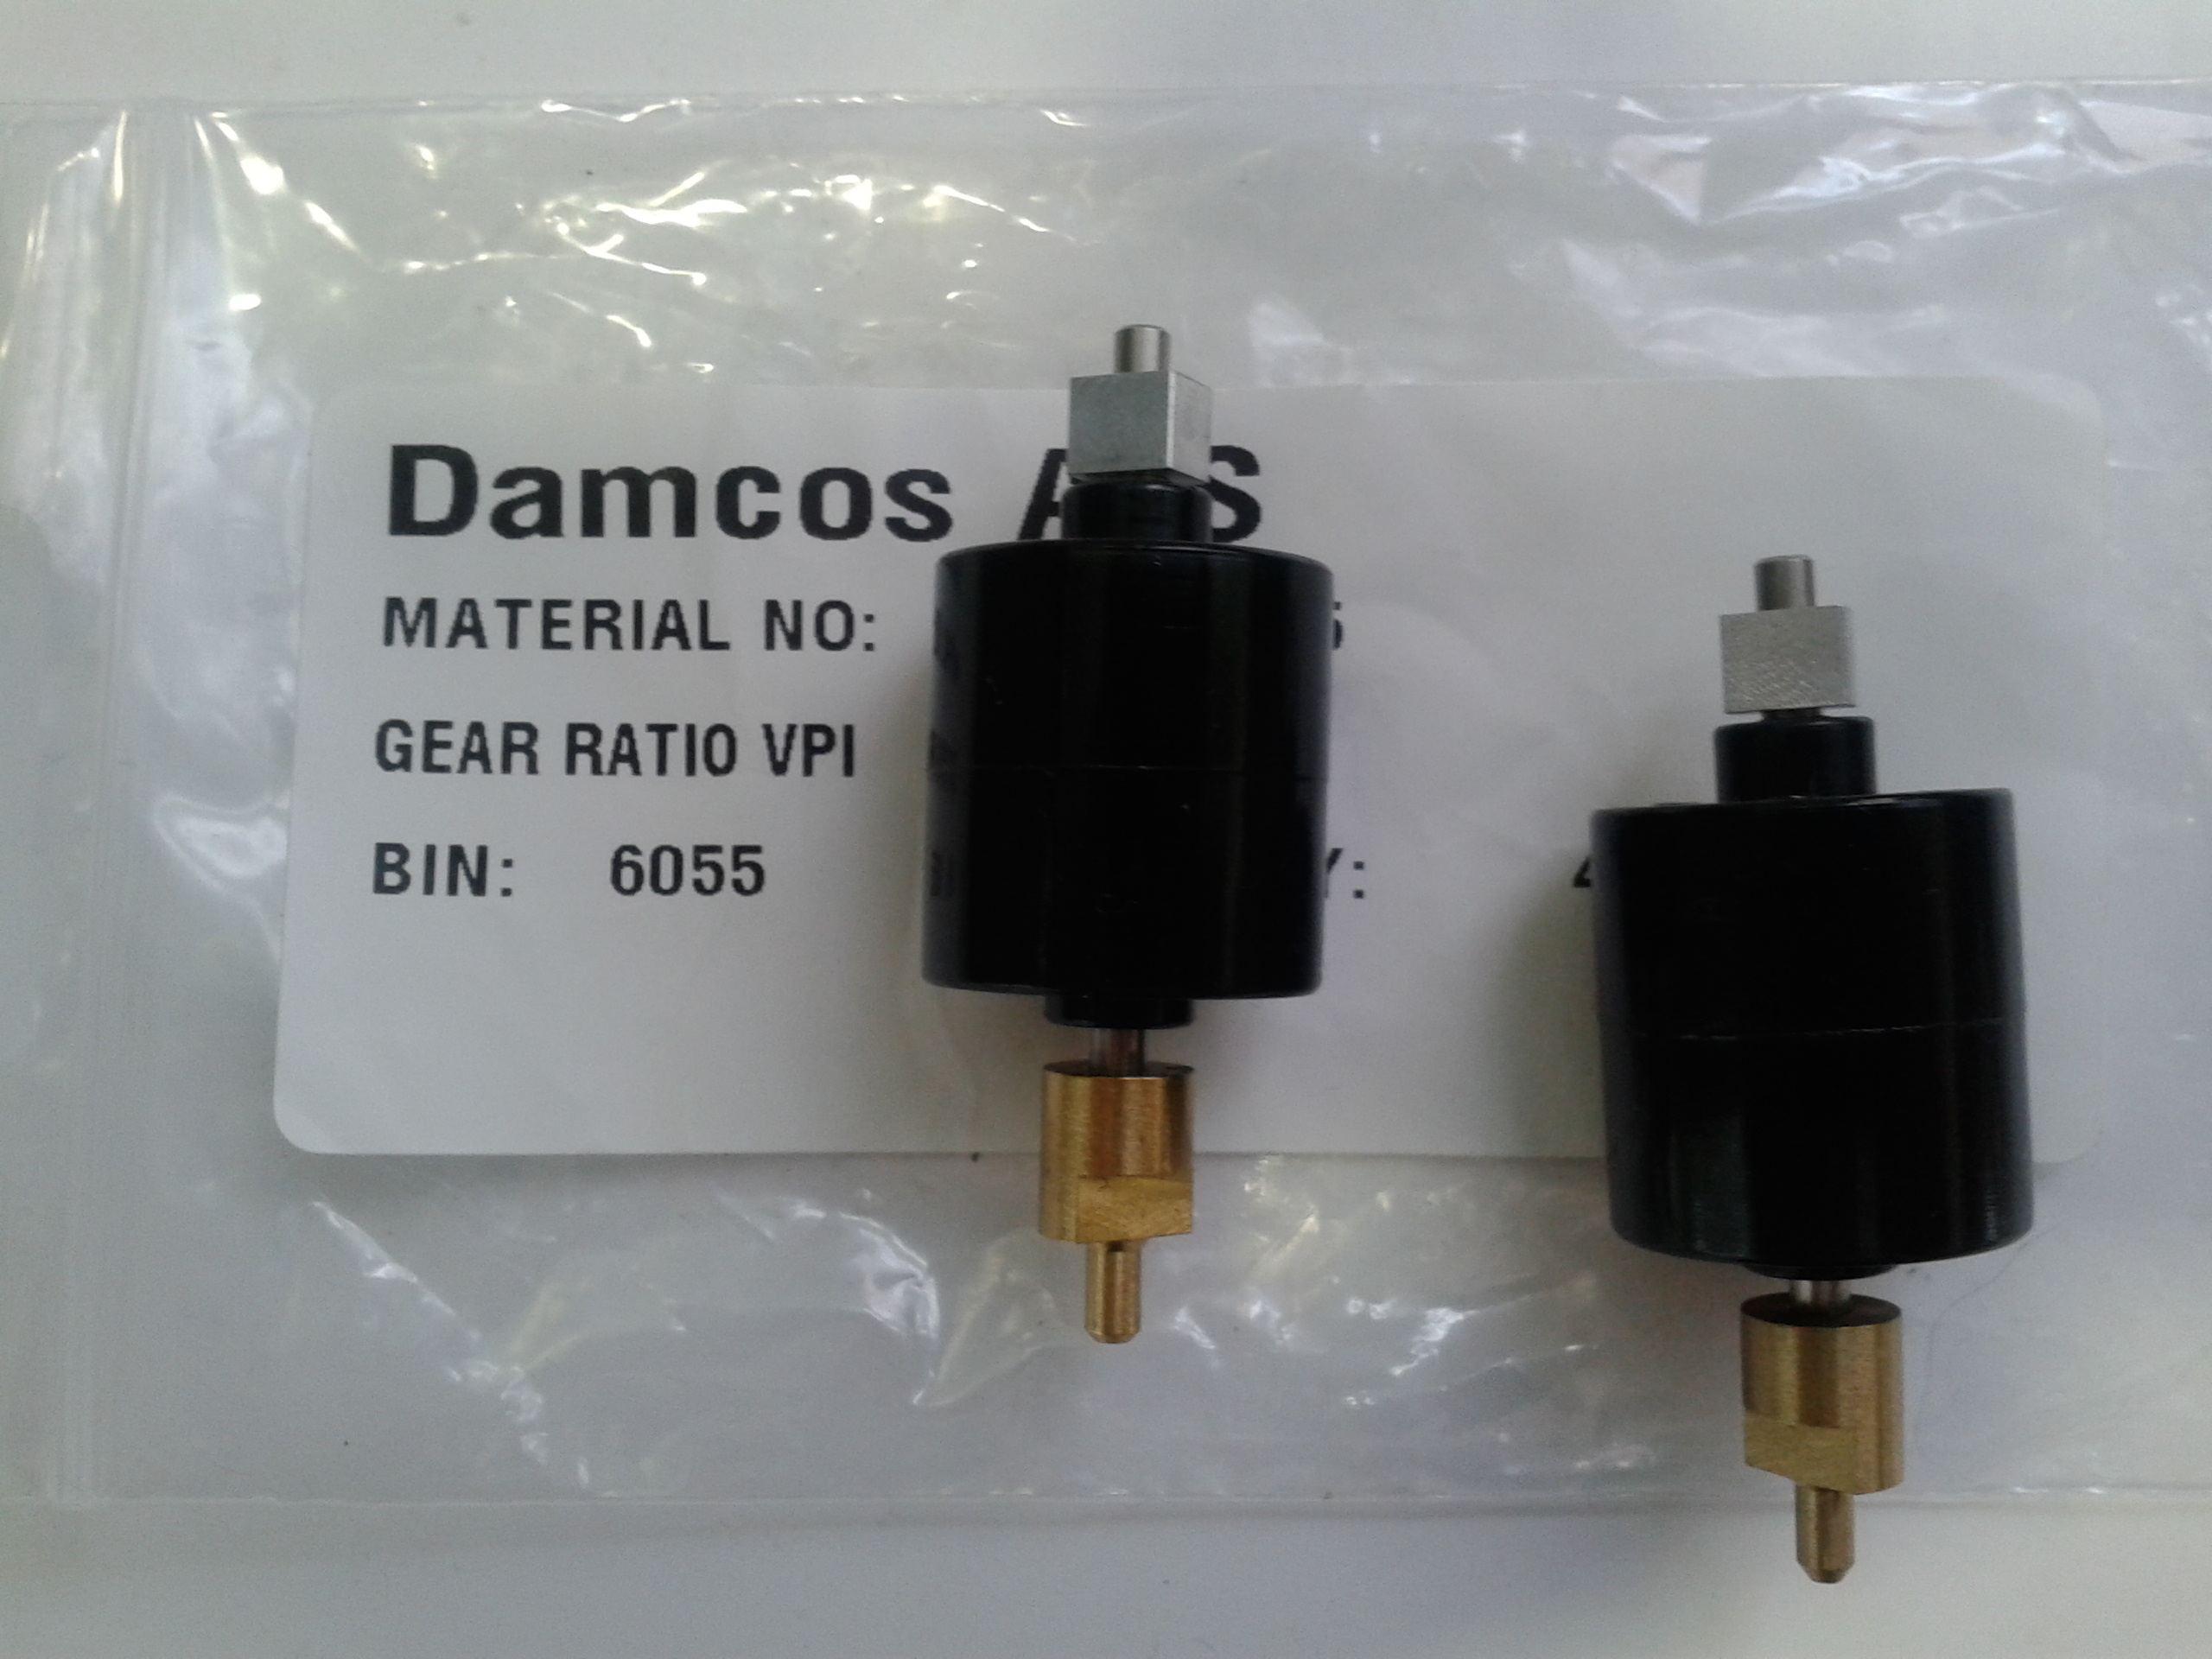 Damcos : Danfoss VPI Gear Ratio 360-0